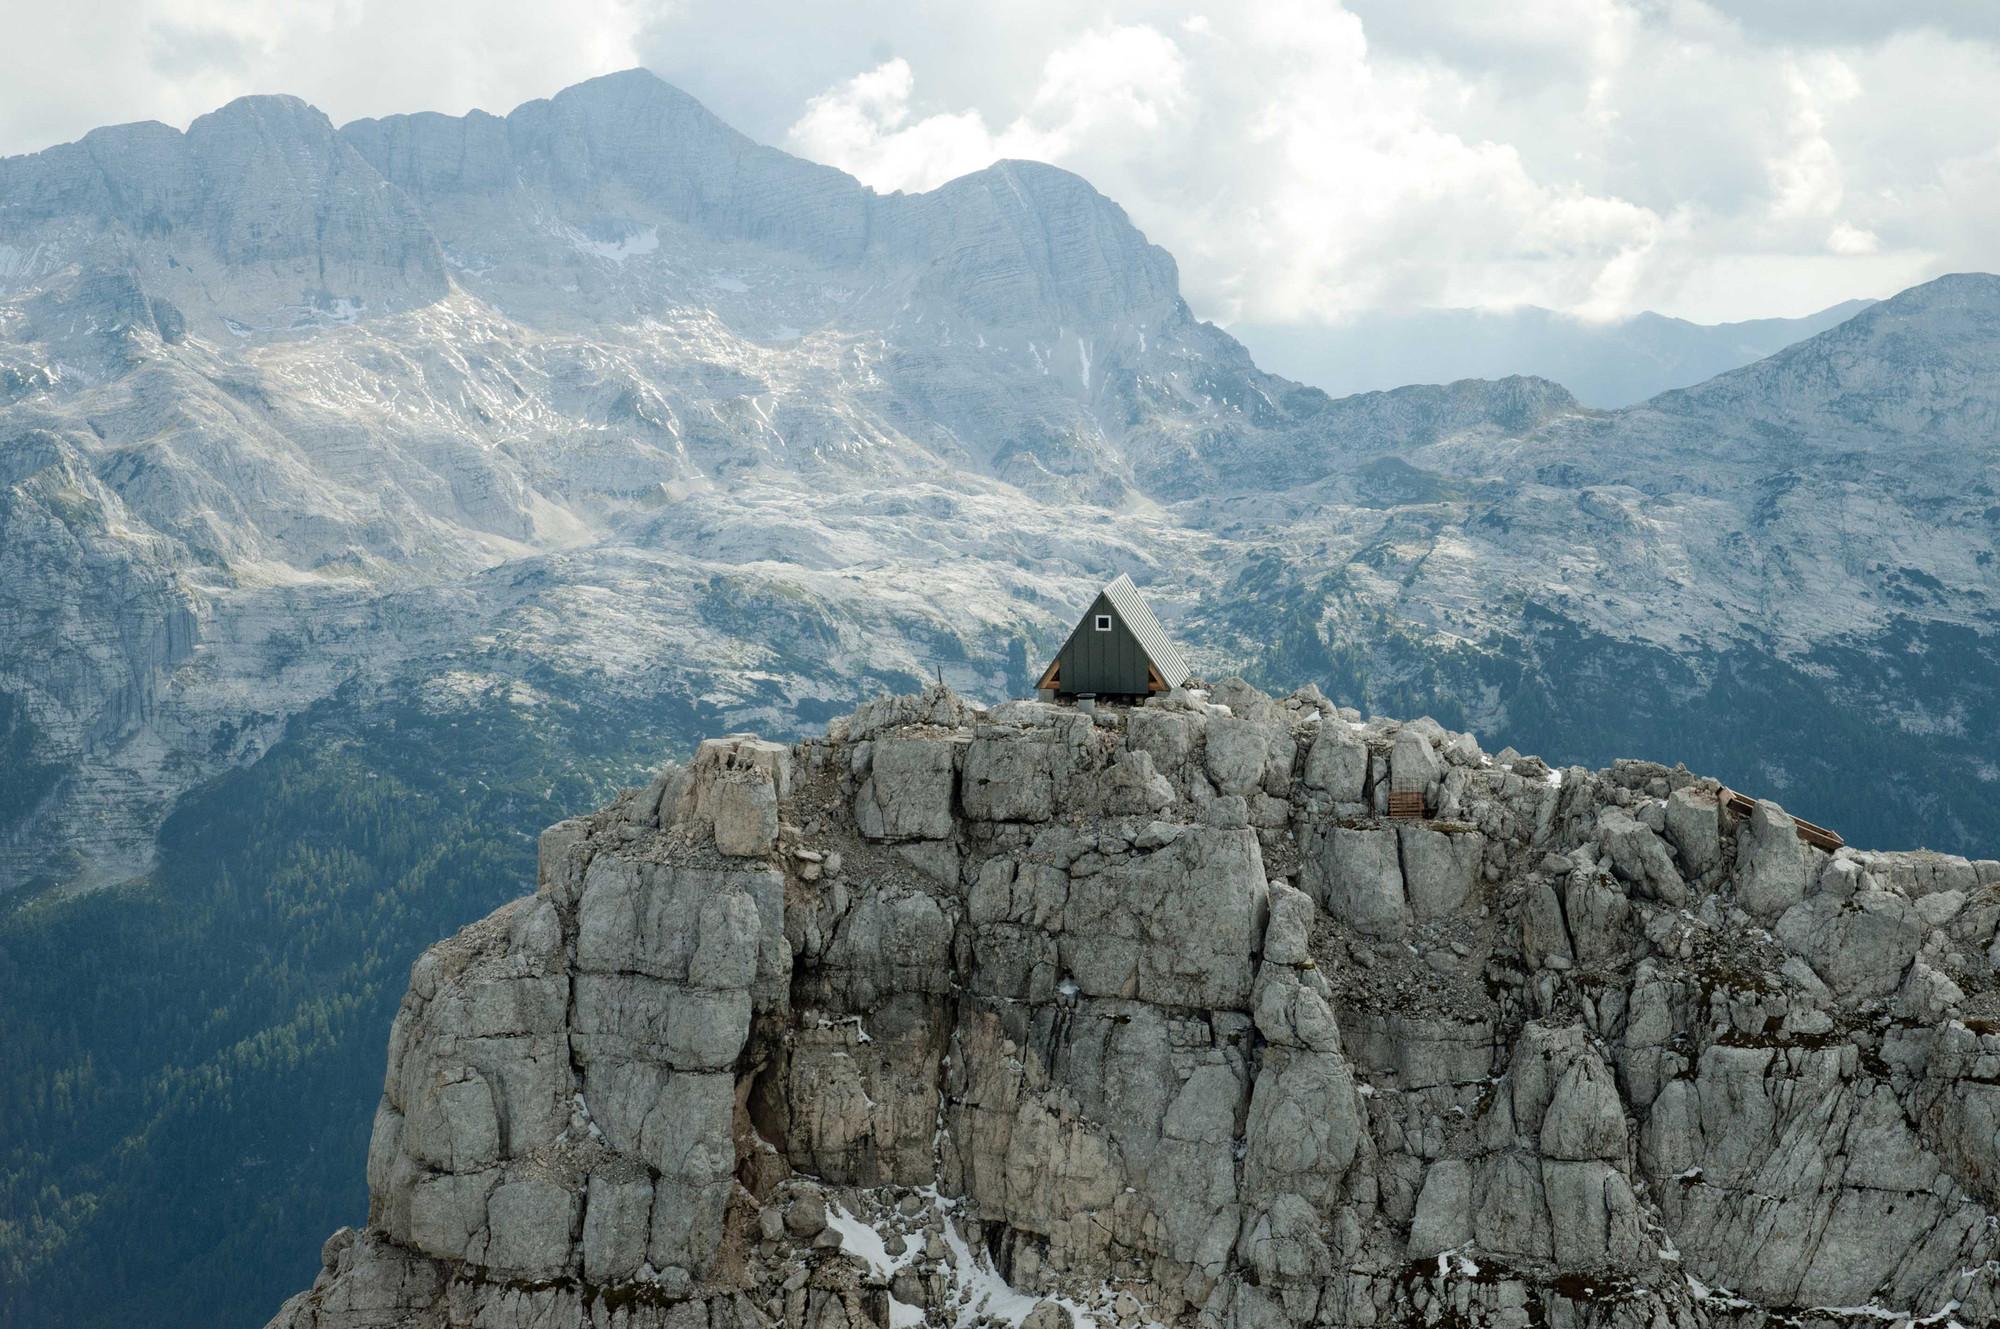 Camping Luca Vuerich / Giovanni Pesamosca Architetto, © Flavio Pesamosca